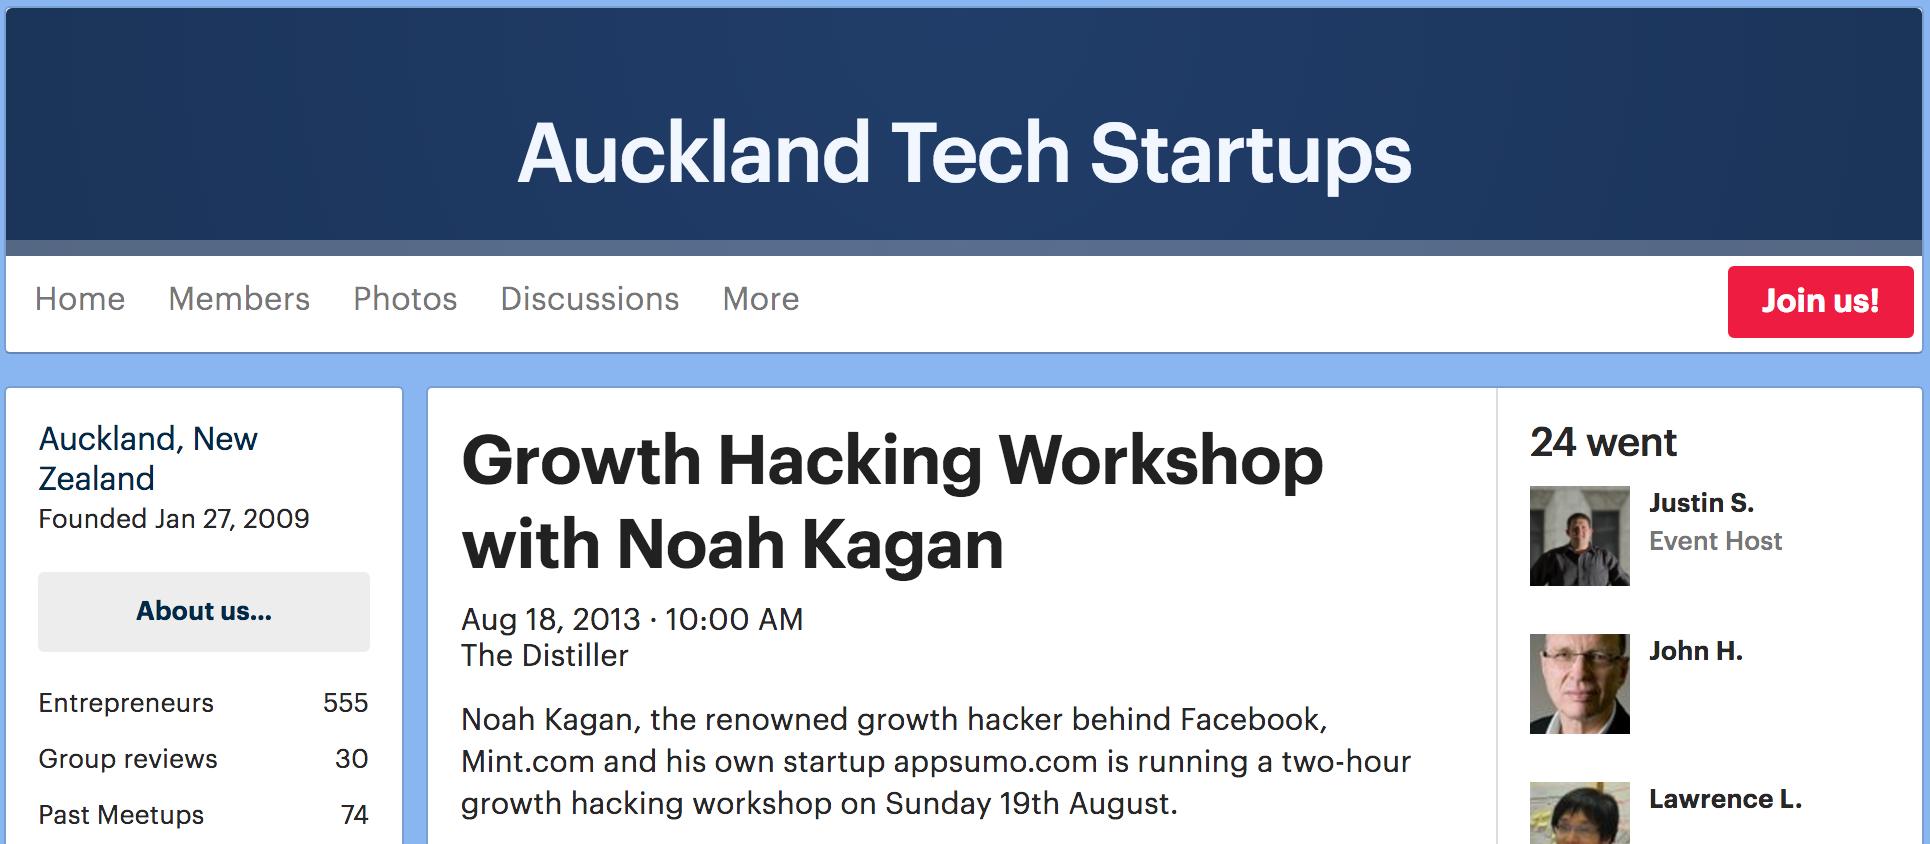 Screenshot showing a speaking event featuring Noah Kagan